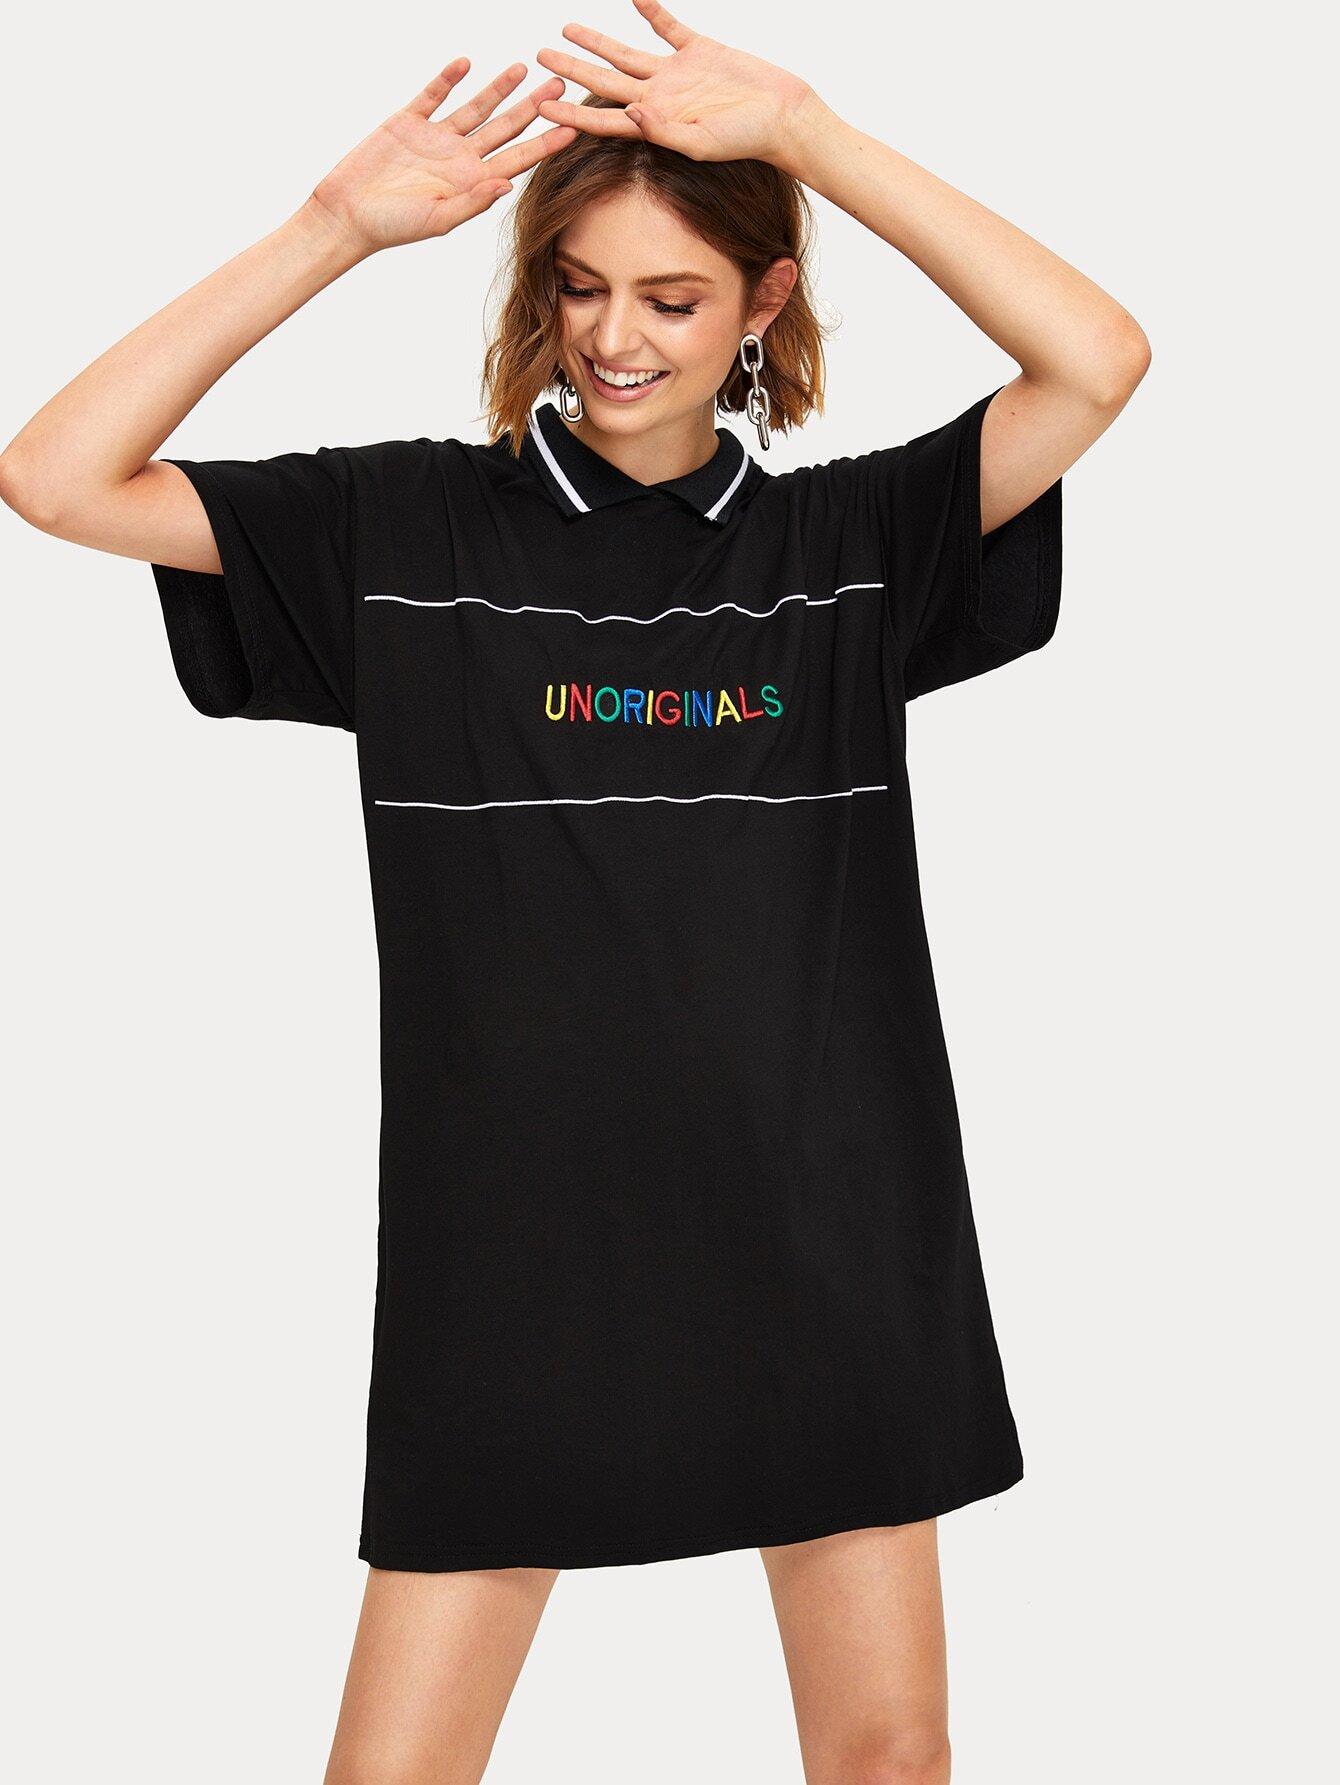 999260cdb8 Letter Embroidery Shift T-shirt Dress EmmaCloth-Women Fast Fashion ...